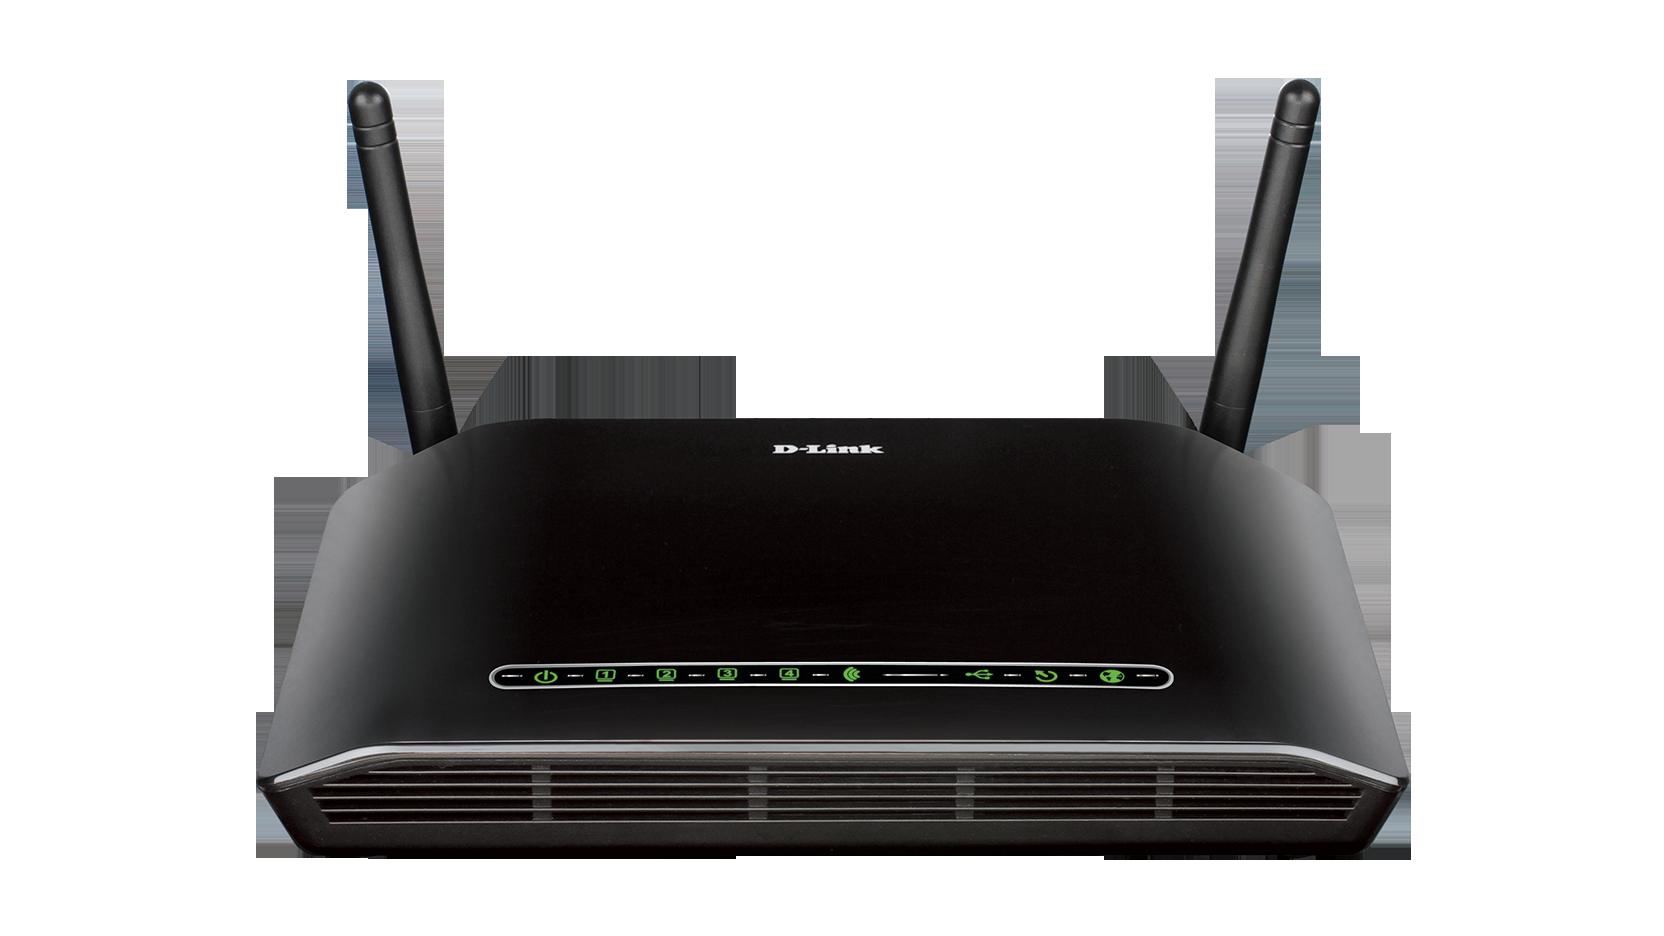 DSL-2751 Wireless N300 ADSL2+ Modem Router | D-Link UK